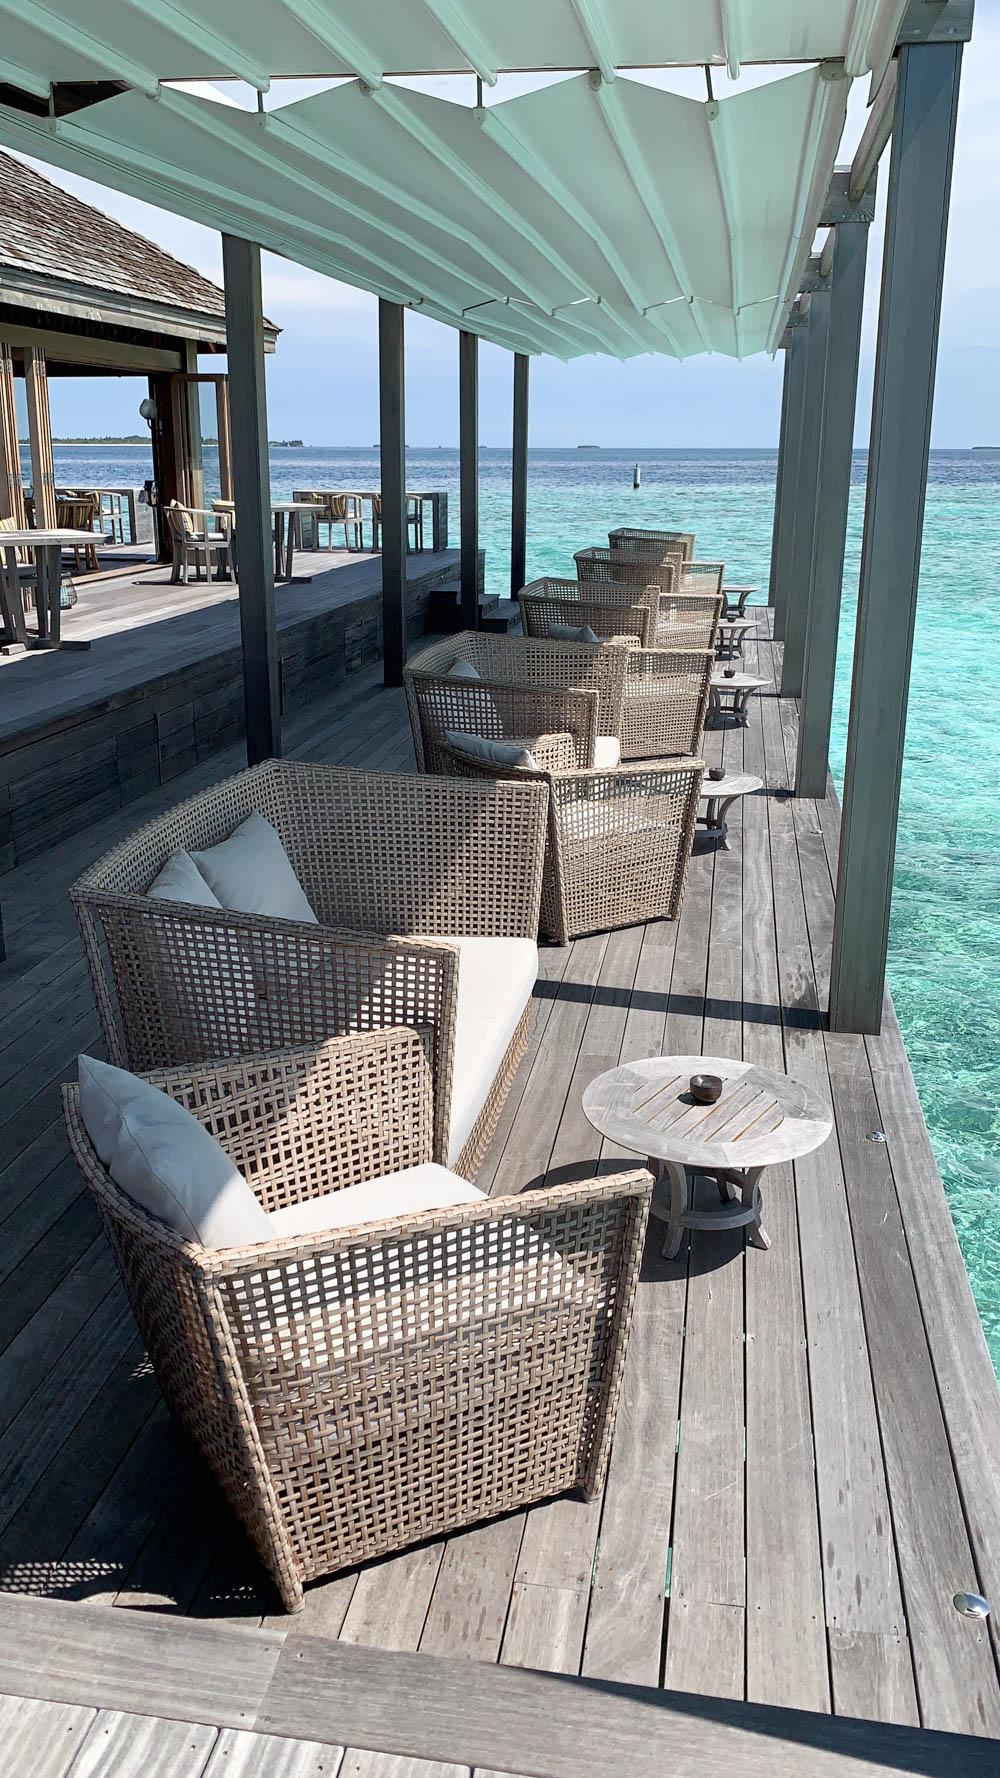 Maldives_Resort_Honeymoon_Hurawalhi_MaldivesTravelAdvisor-29.jpg